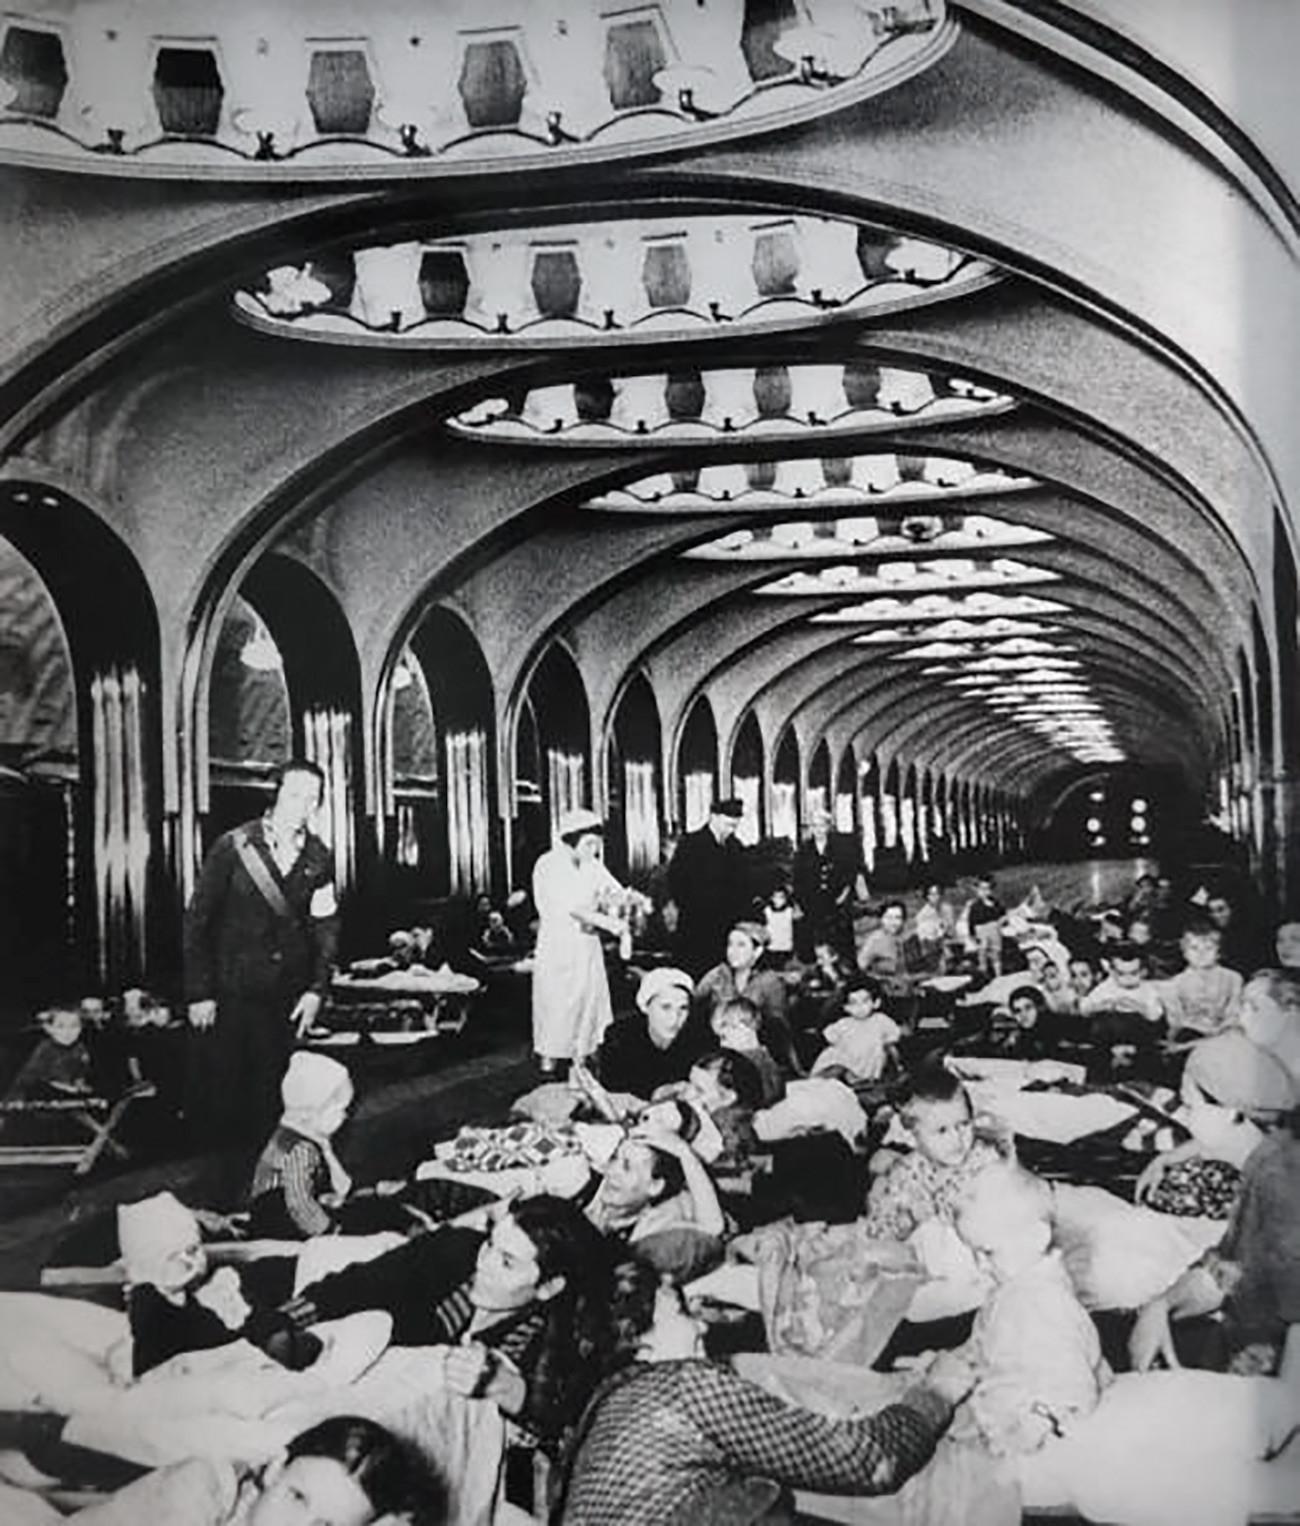 Estação Mayakovskaya, 1941